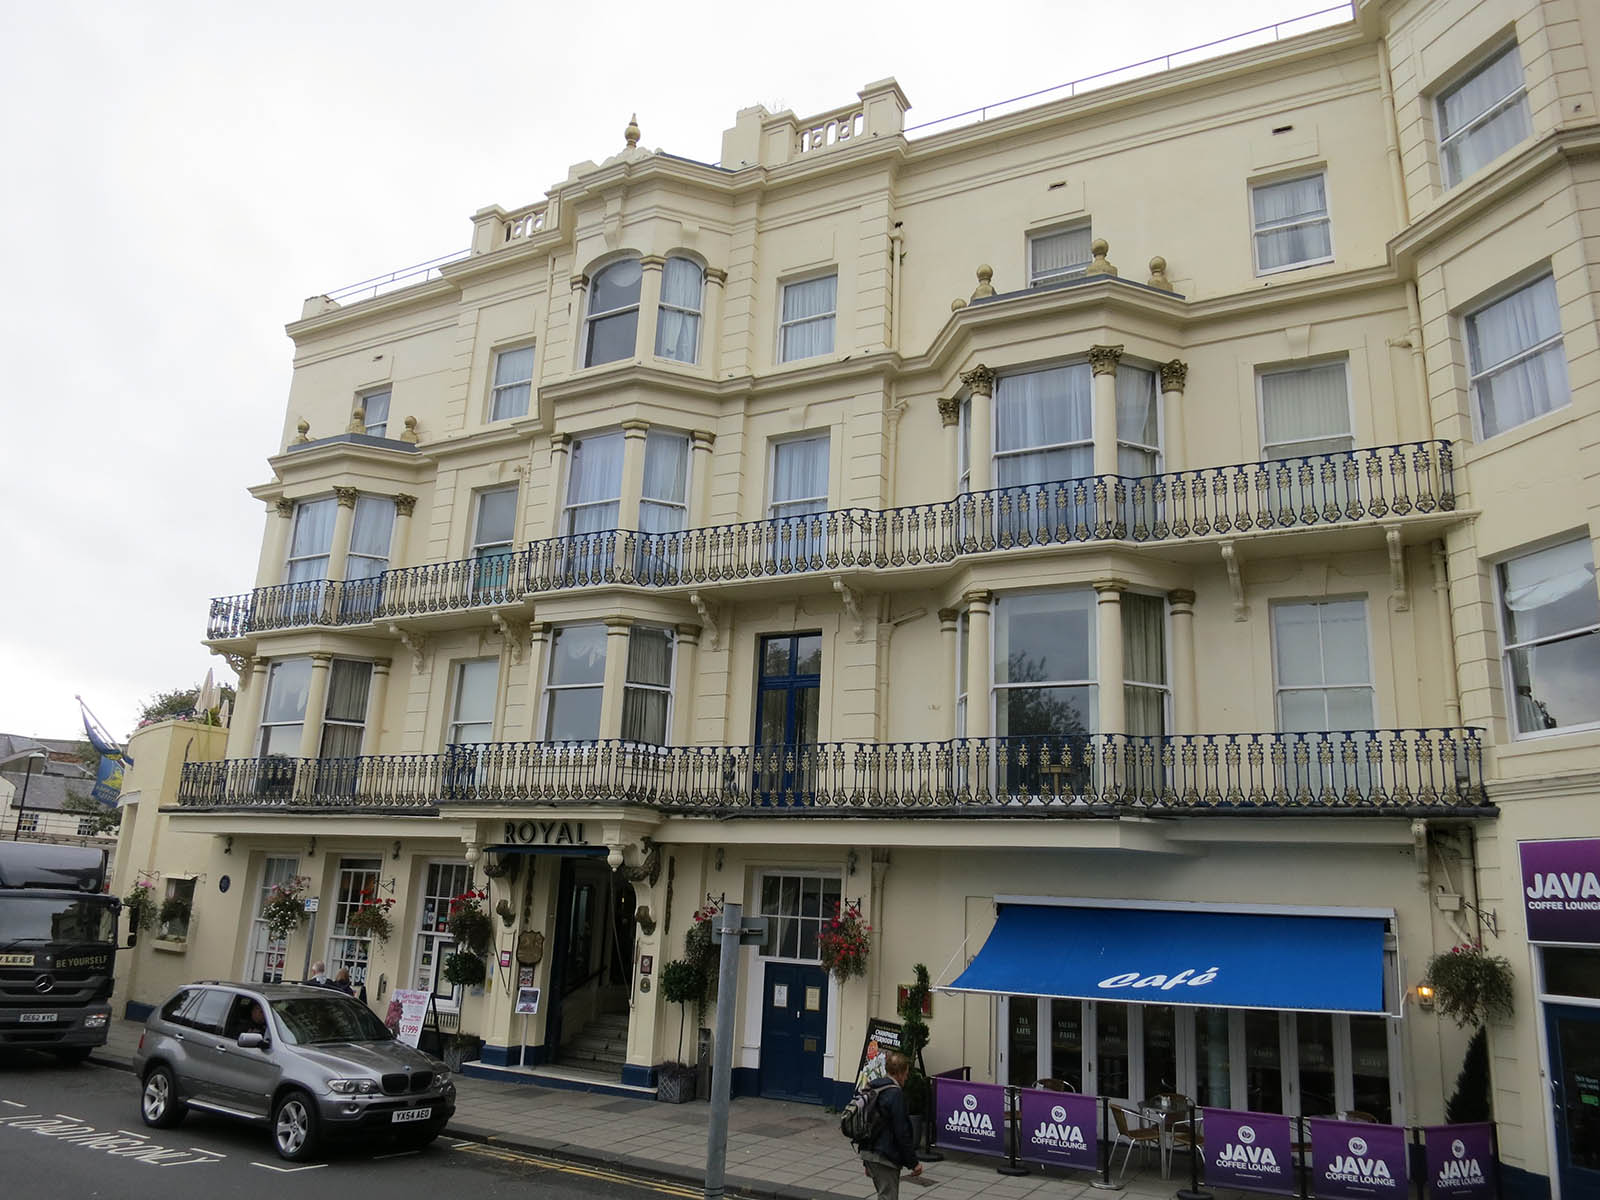 Royal Hotel, Scarborough